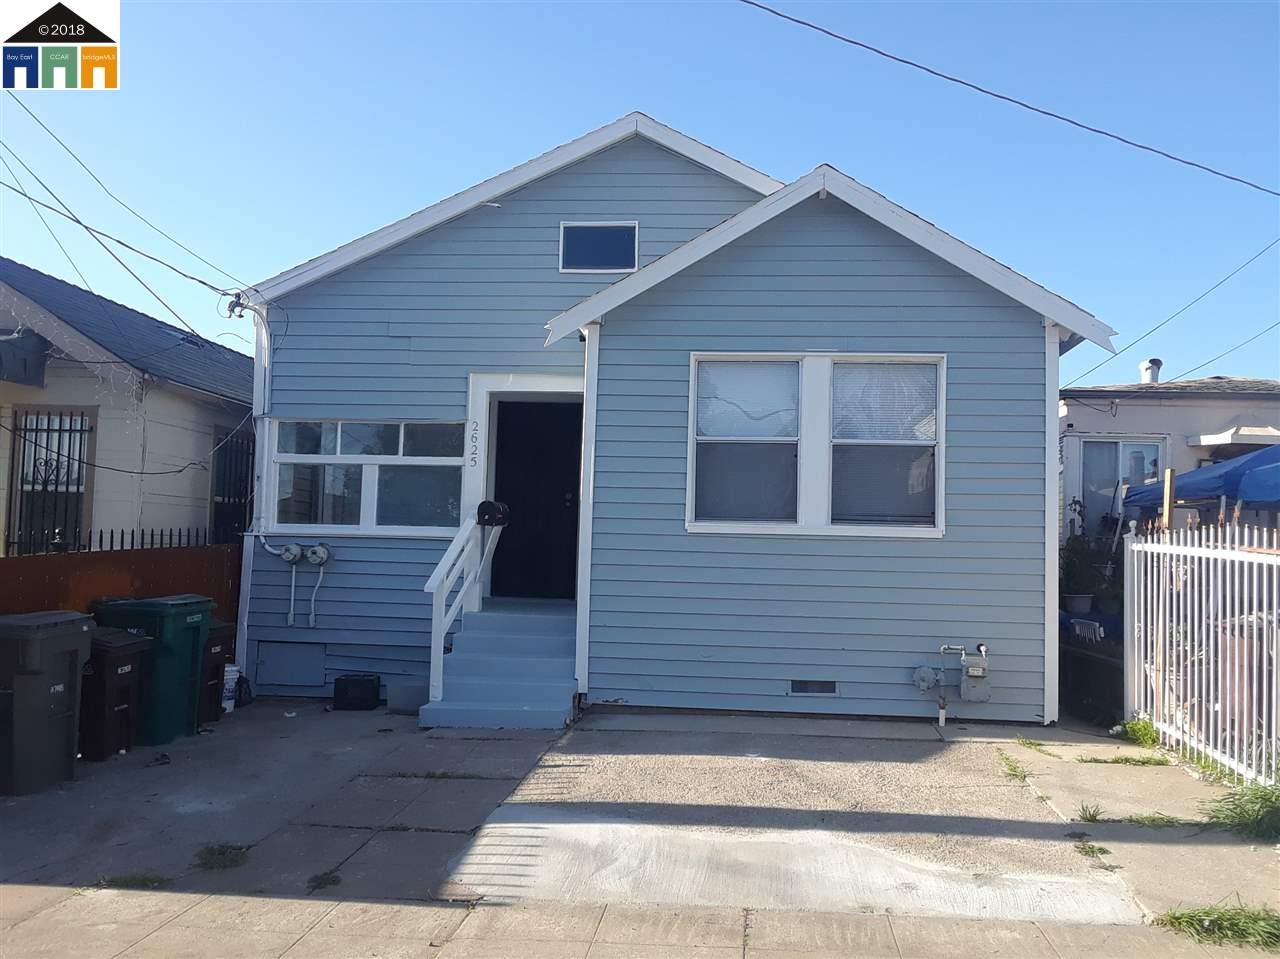 Multi-Family Home for Sale at 2625 75th Avenue 2625 75th Avenue Oakland, California 94605 United States